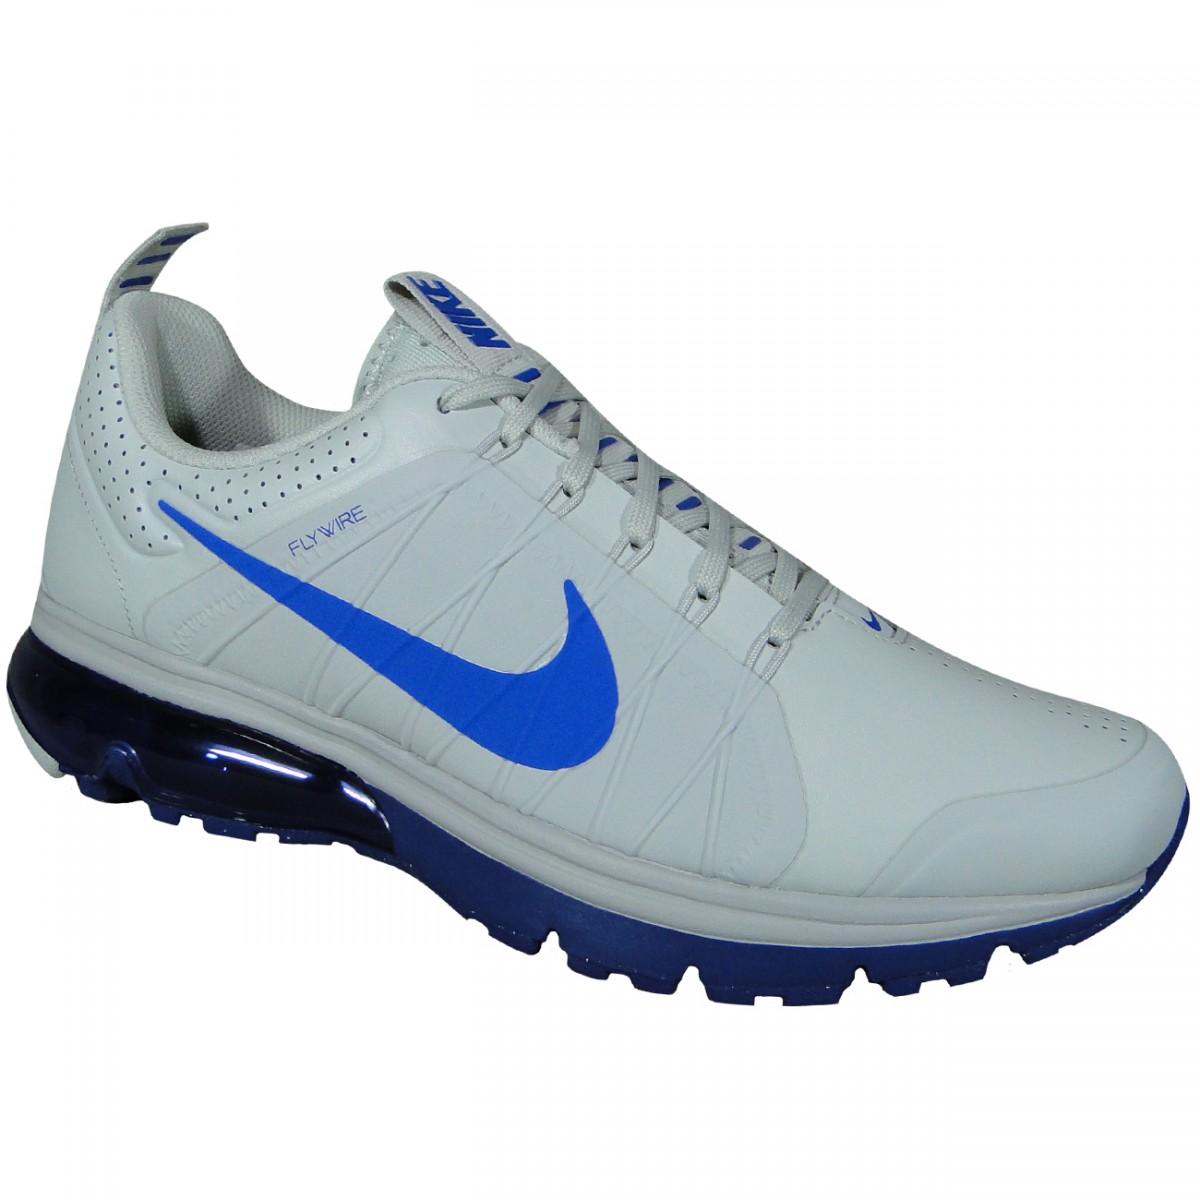 8fb8c2791c Tenis Nike Air Max Supreme 4 806769 004 - Gelo Azul - Chuteira Nike ...